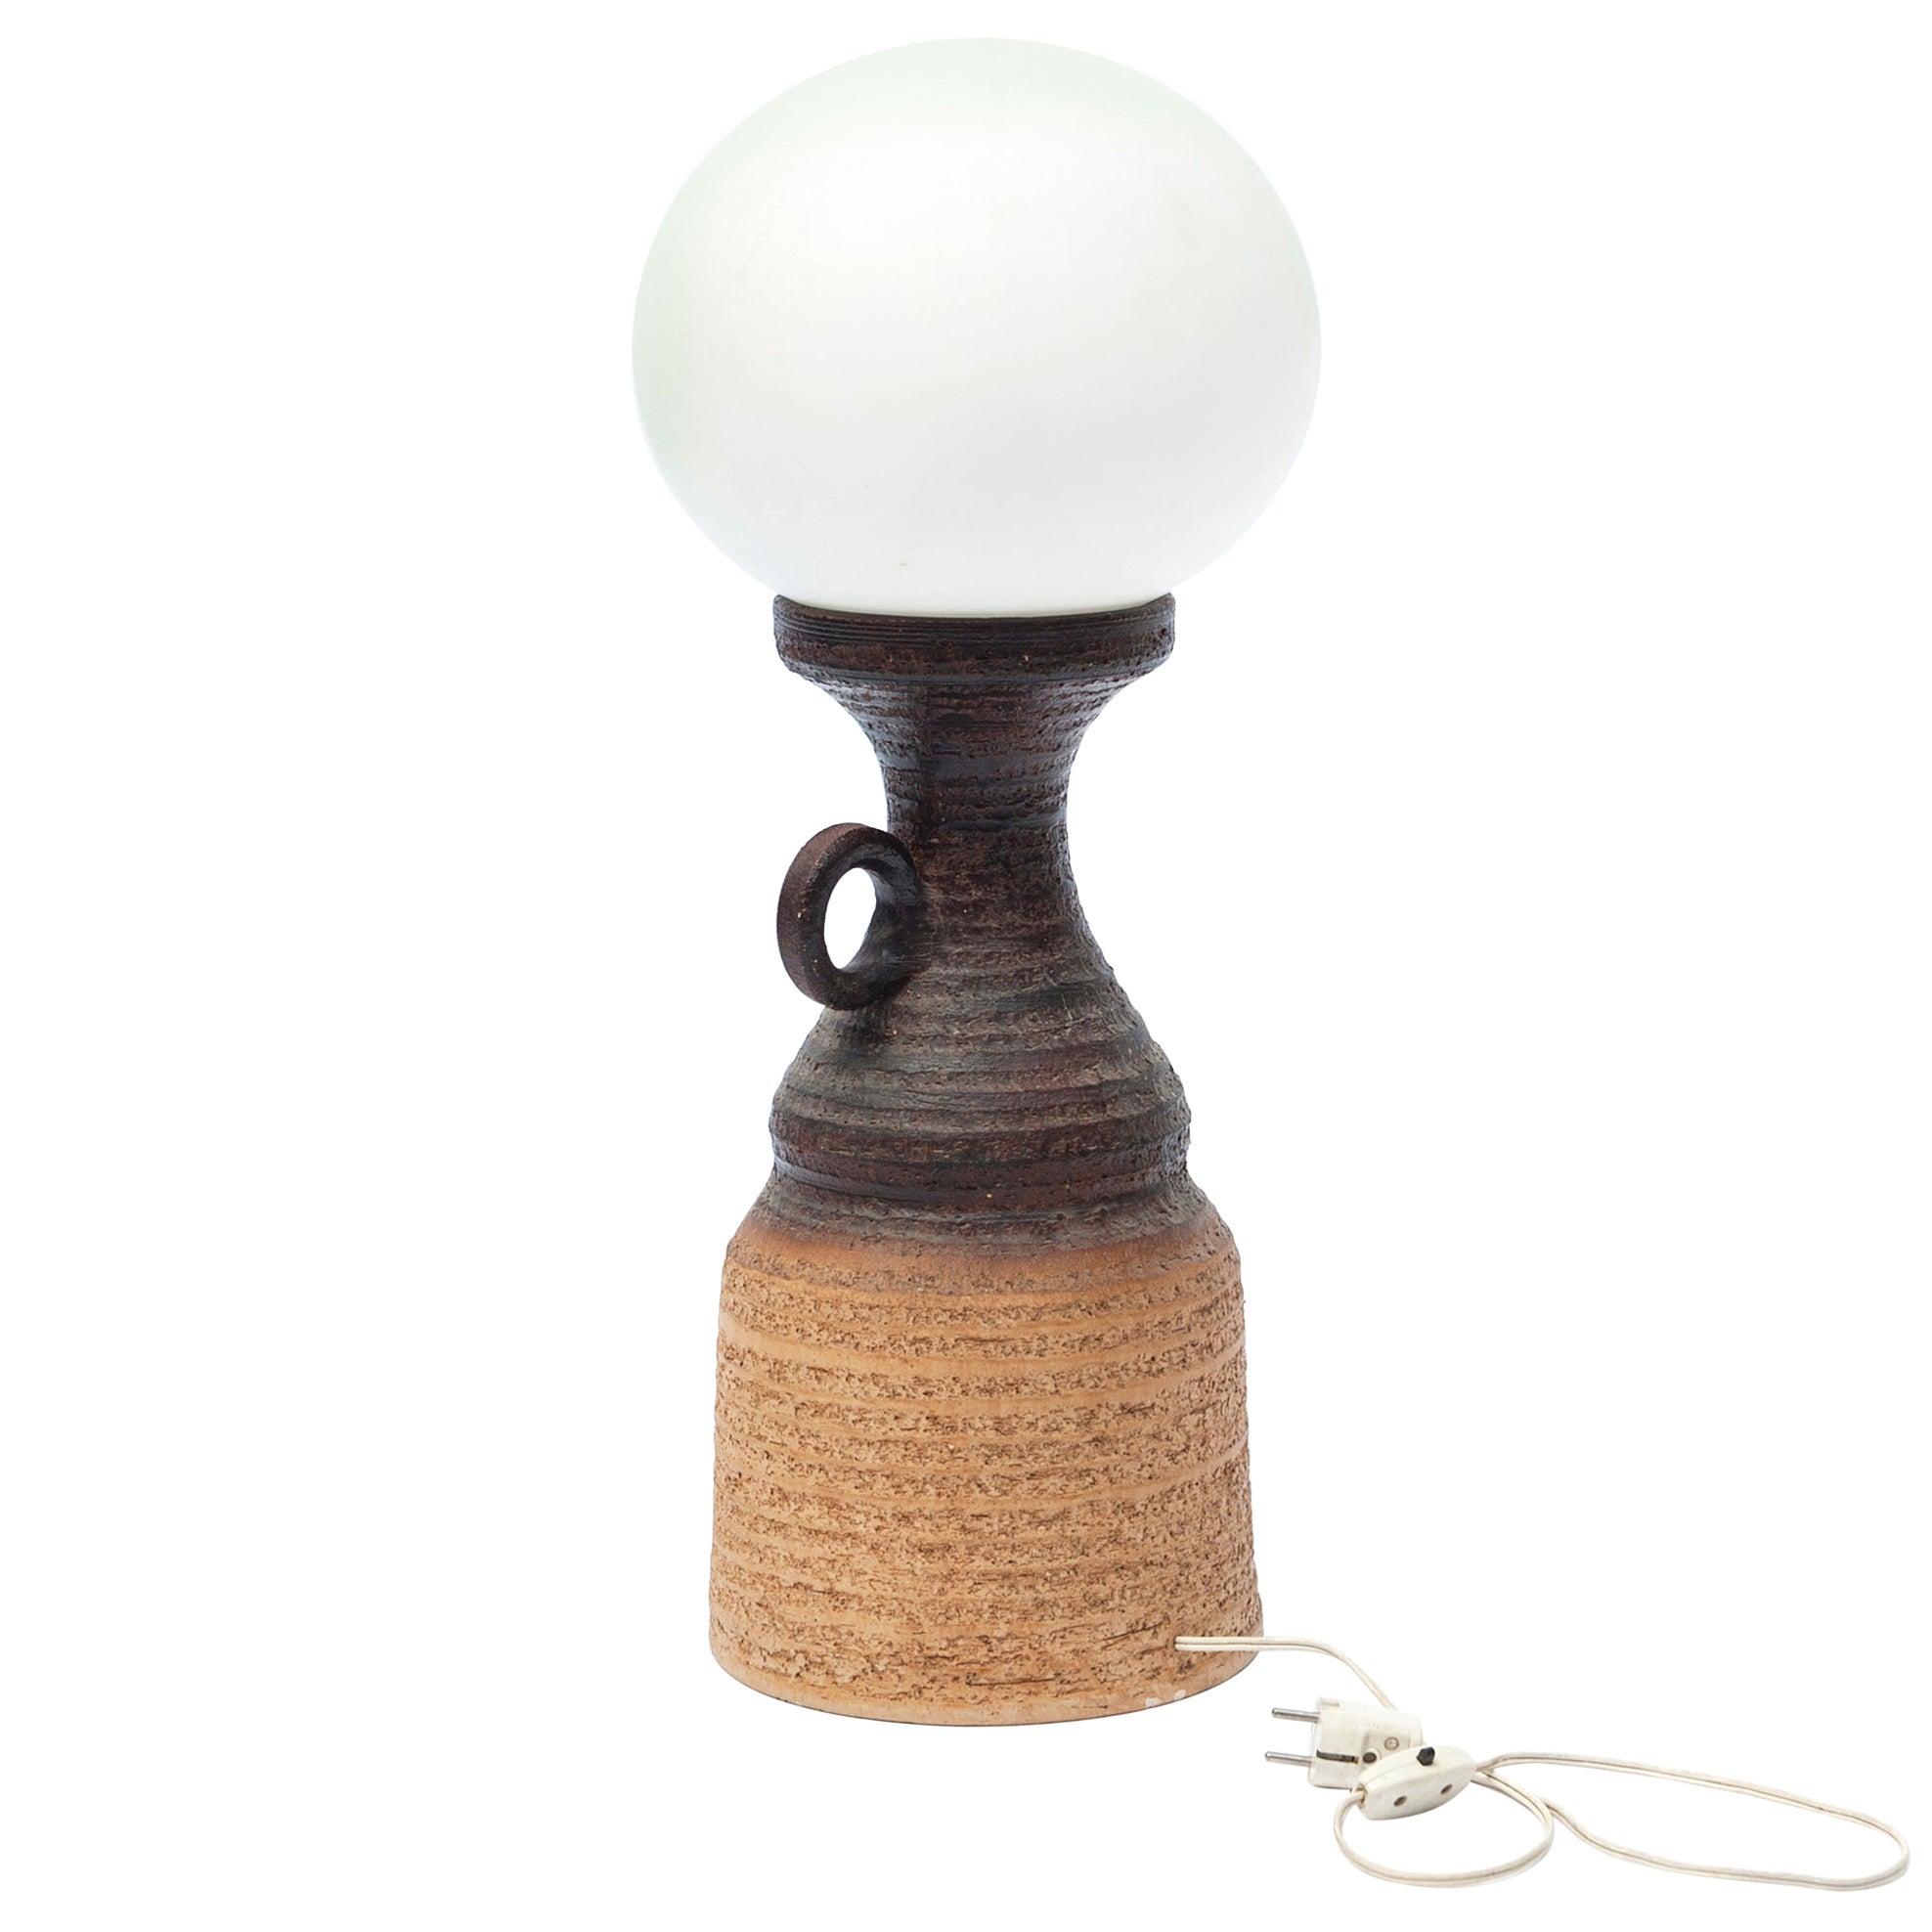 Ceramic Pottery Table Lamp with Globe Shade, 1970s